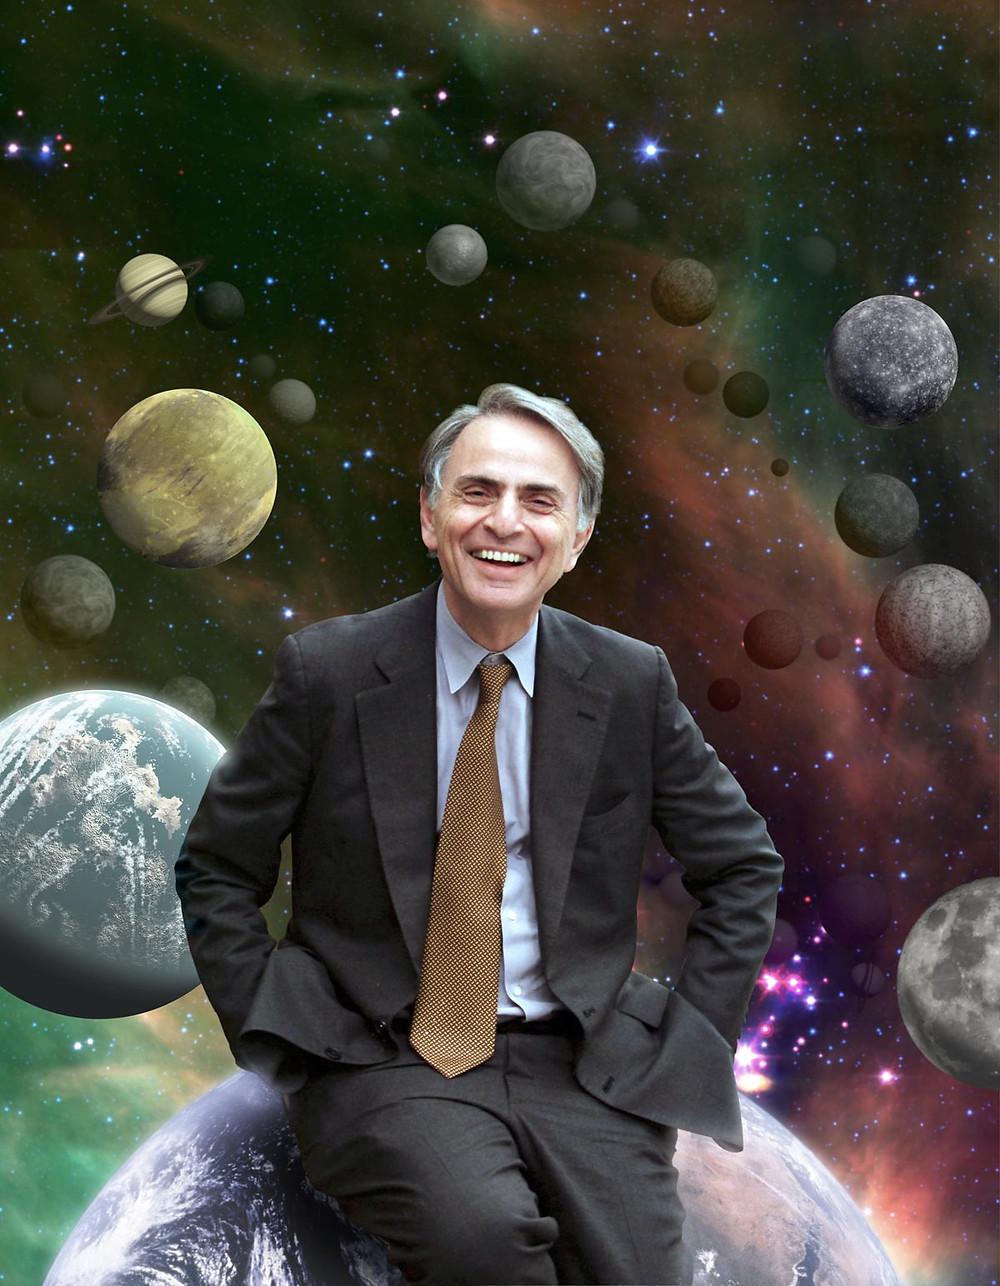 Carl Sagan. Image credit: NASA/Cosmos Studios